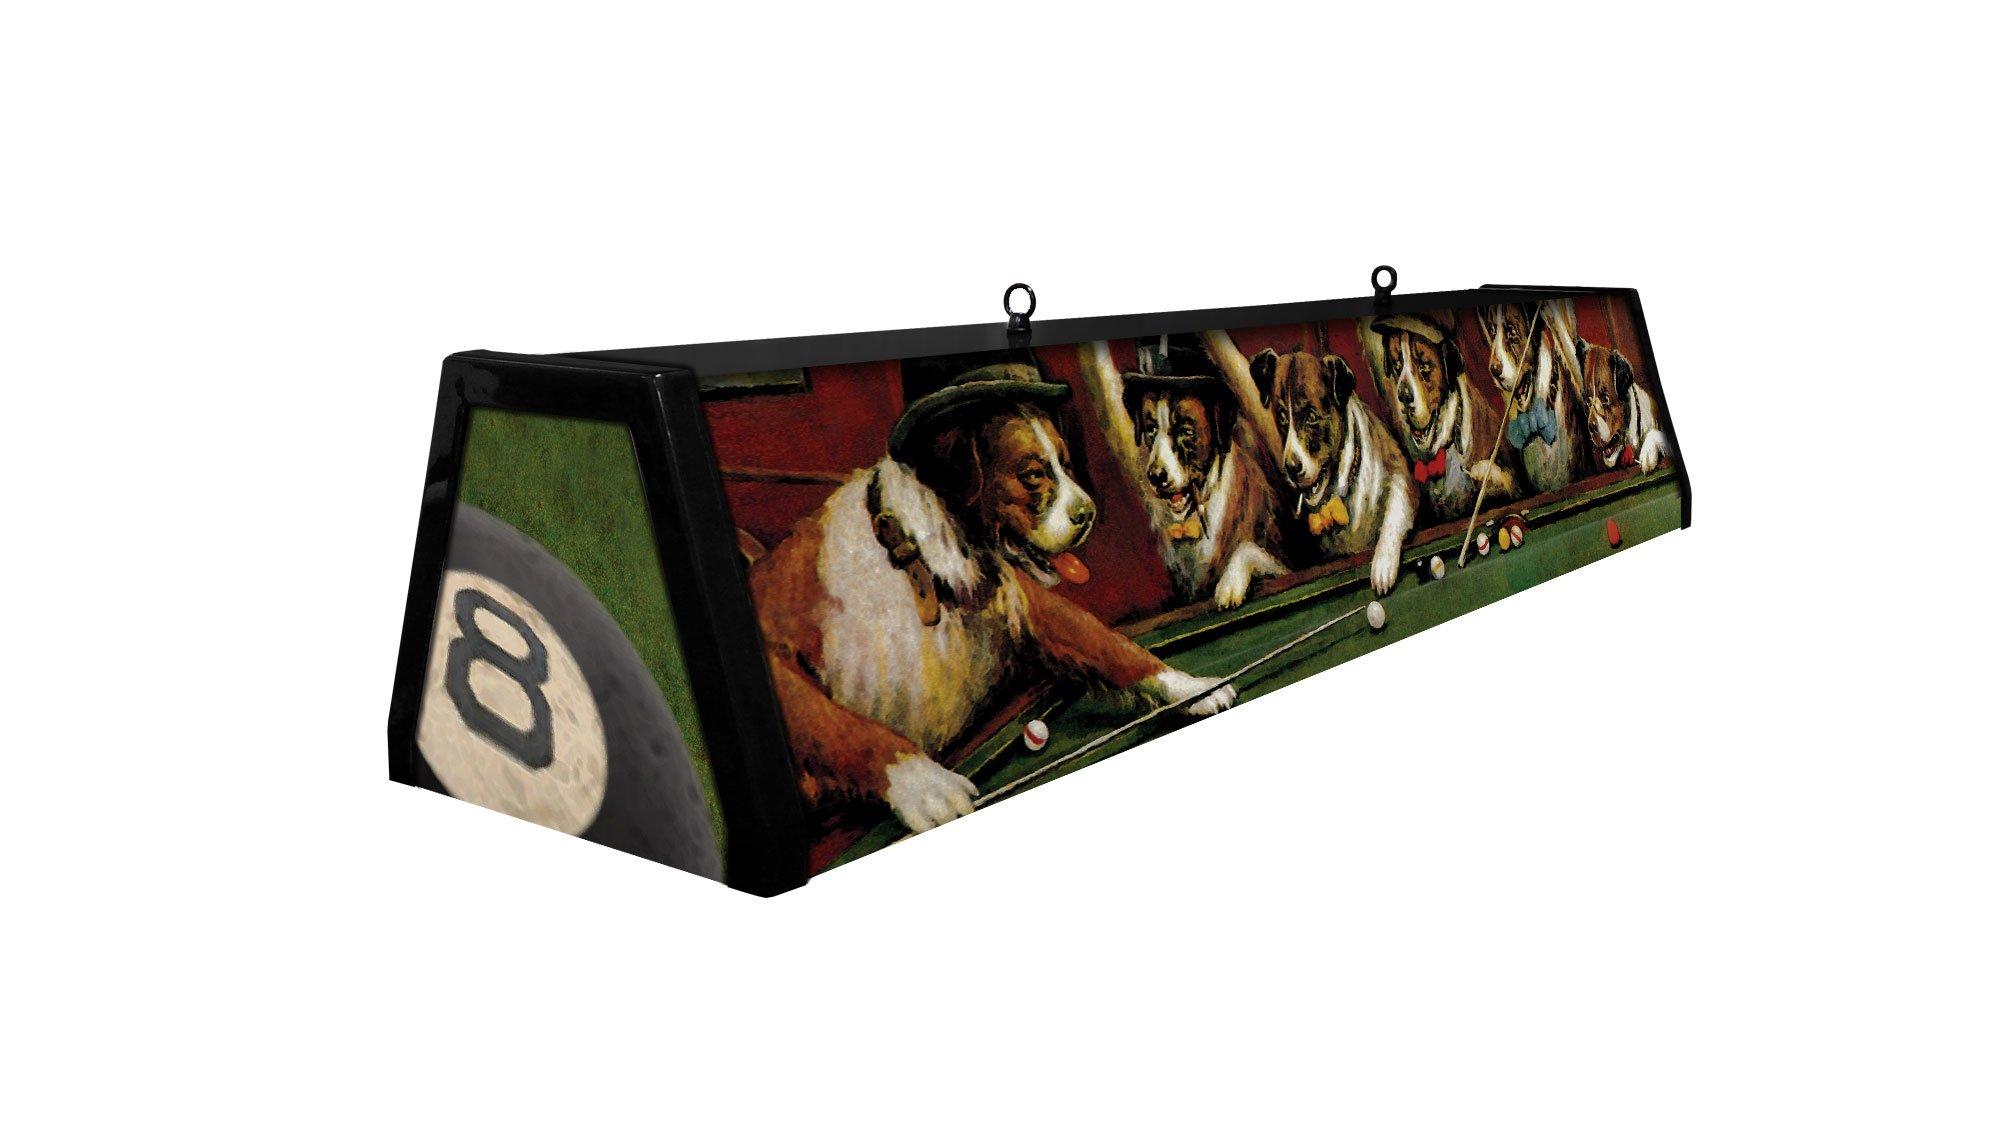 44'' Acrylic Pool Table Light, Dogs Playing Pool